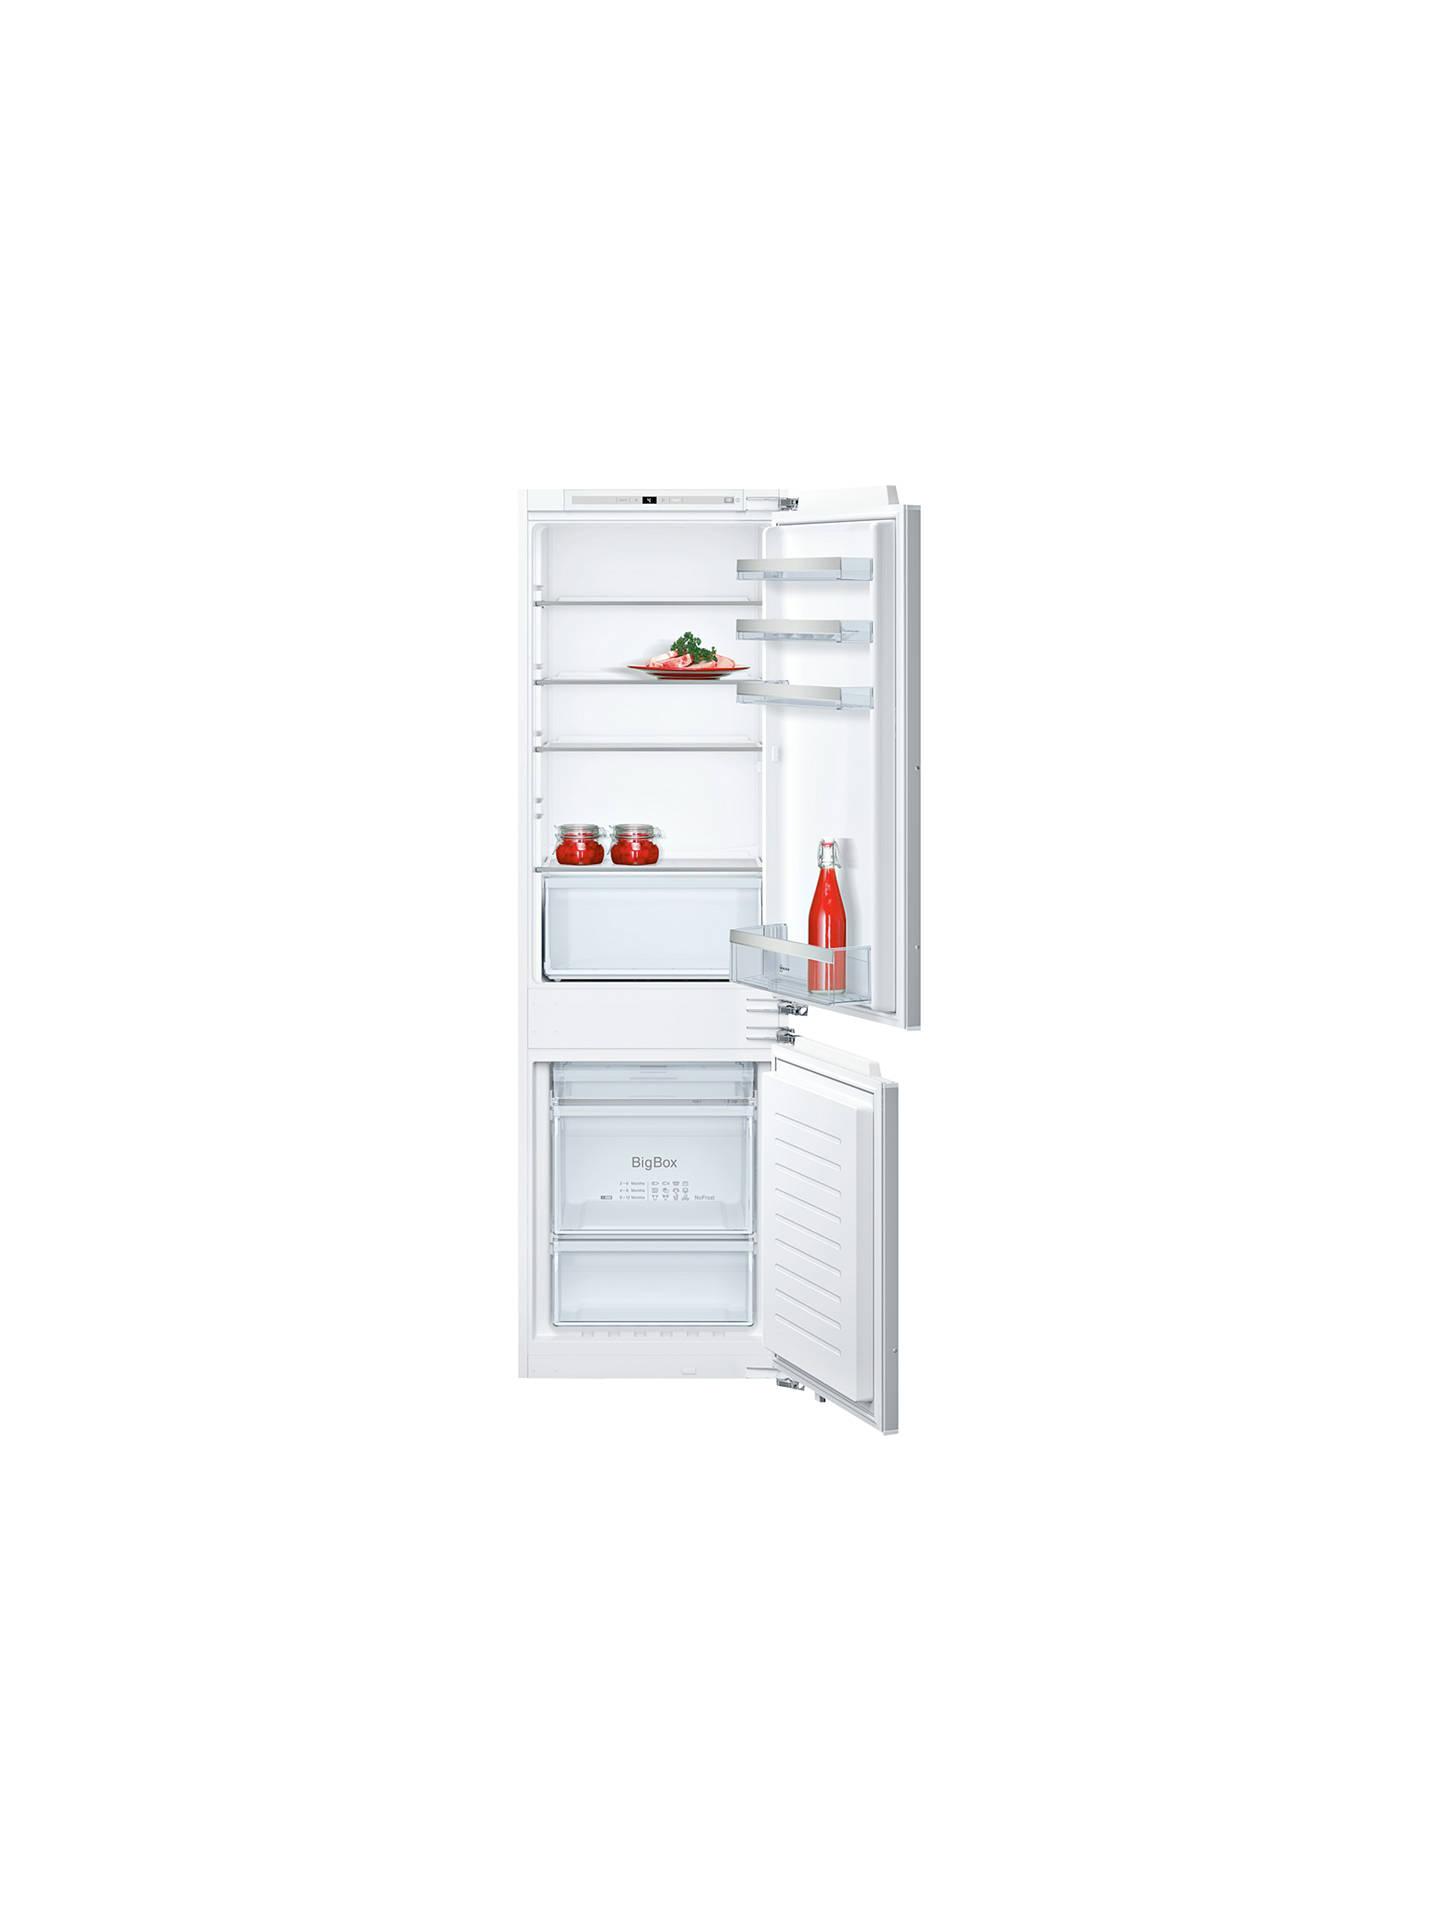 Neff Ki7862f30g Integrated Fridge Freezer A Energy Rating 54cm Refrigerator Alarm Circuit Buyneff Wide Online At Johnlewis